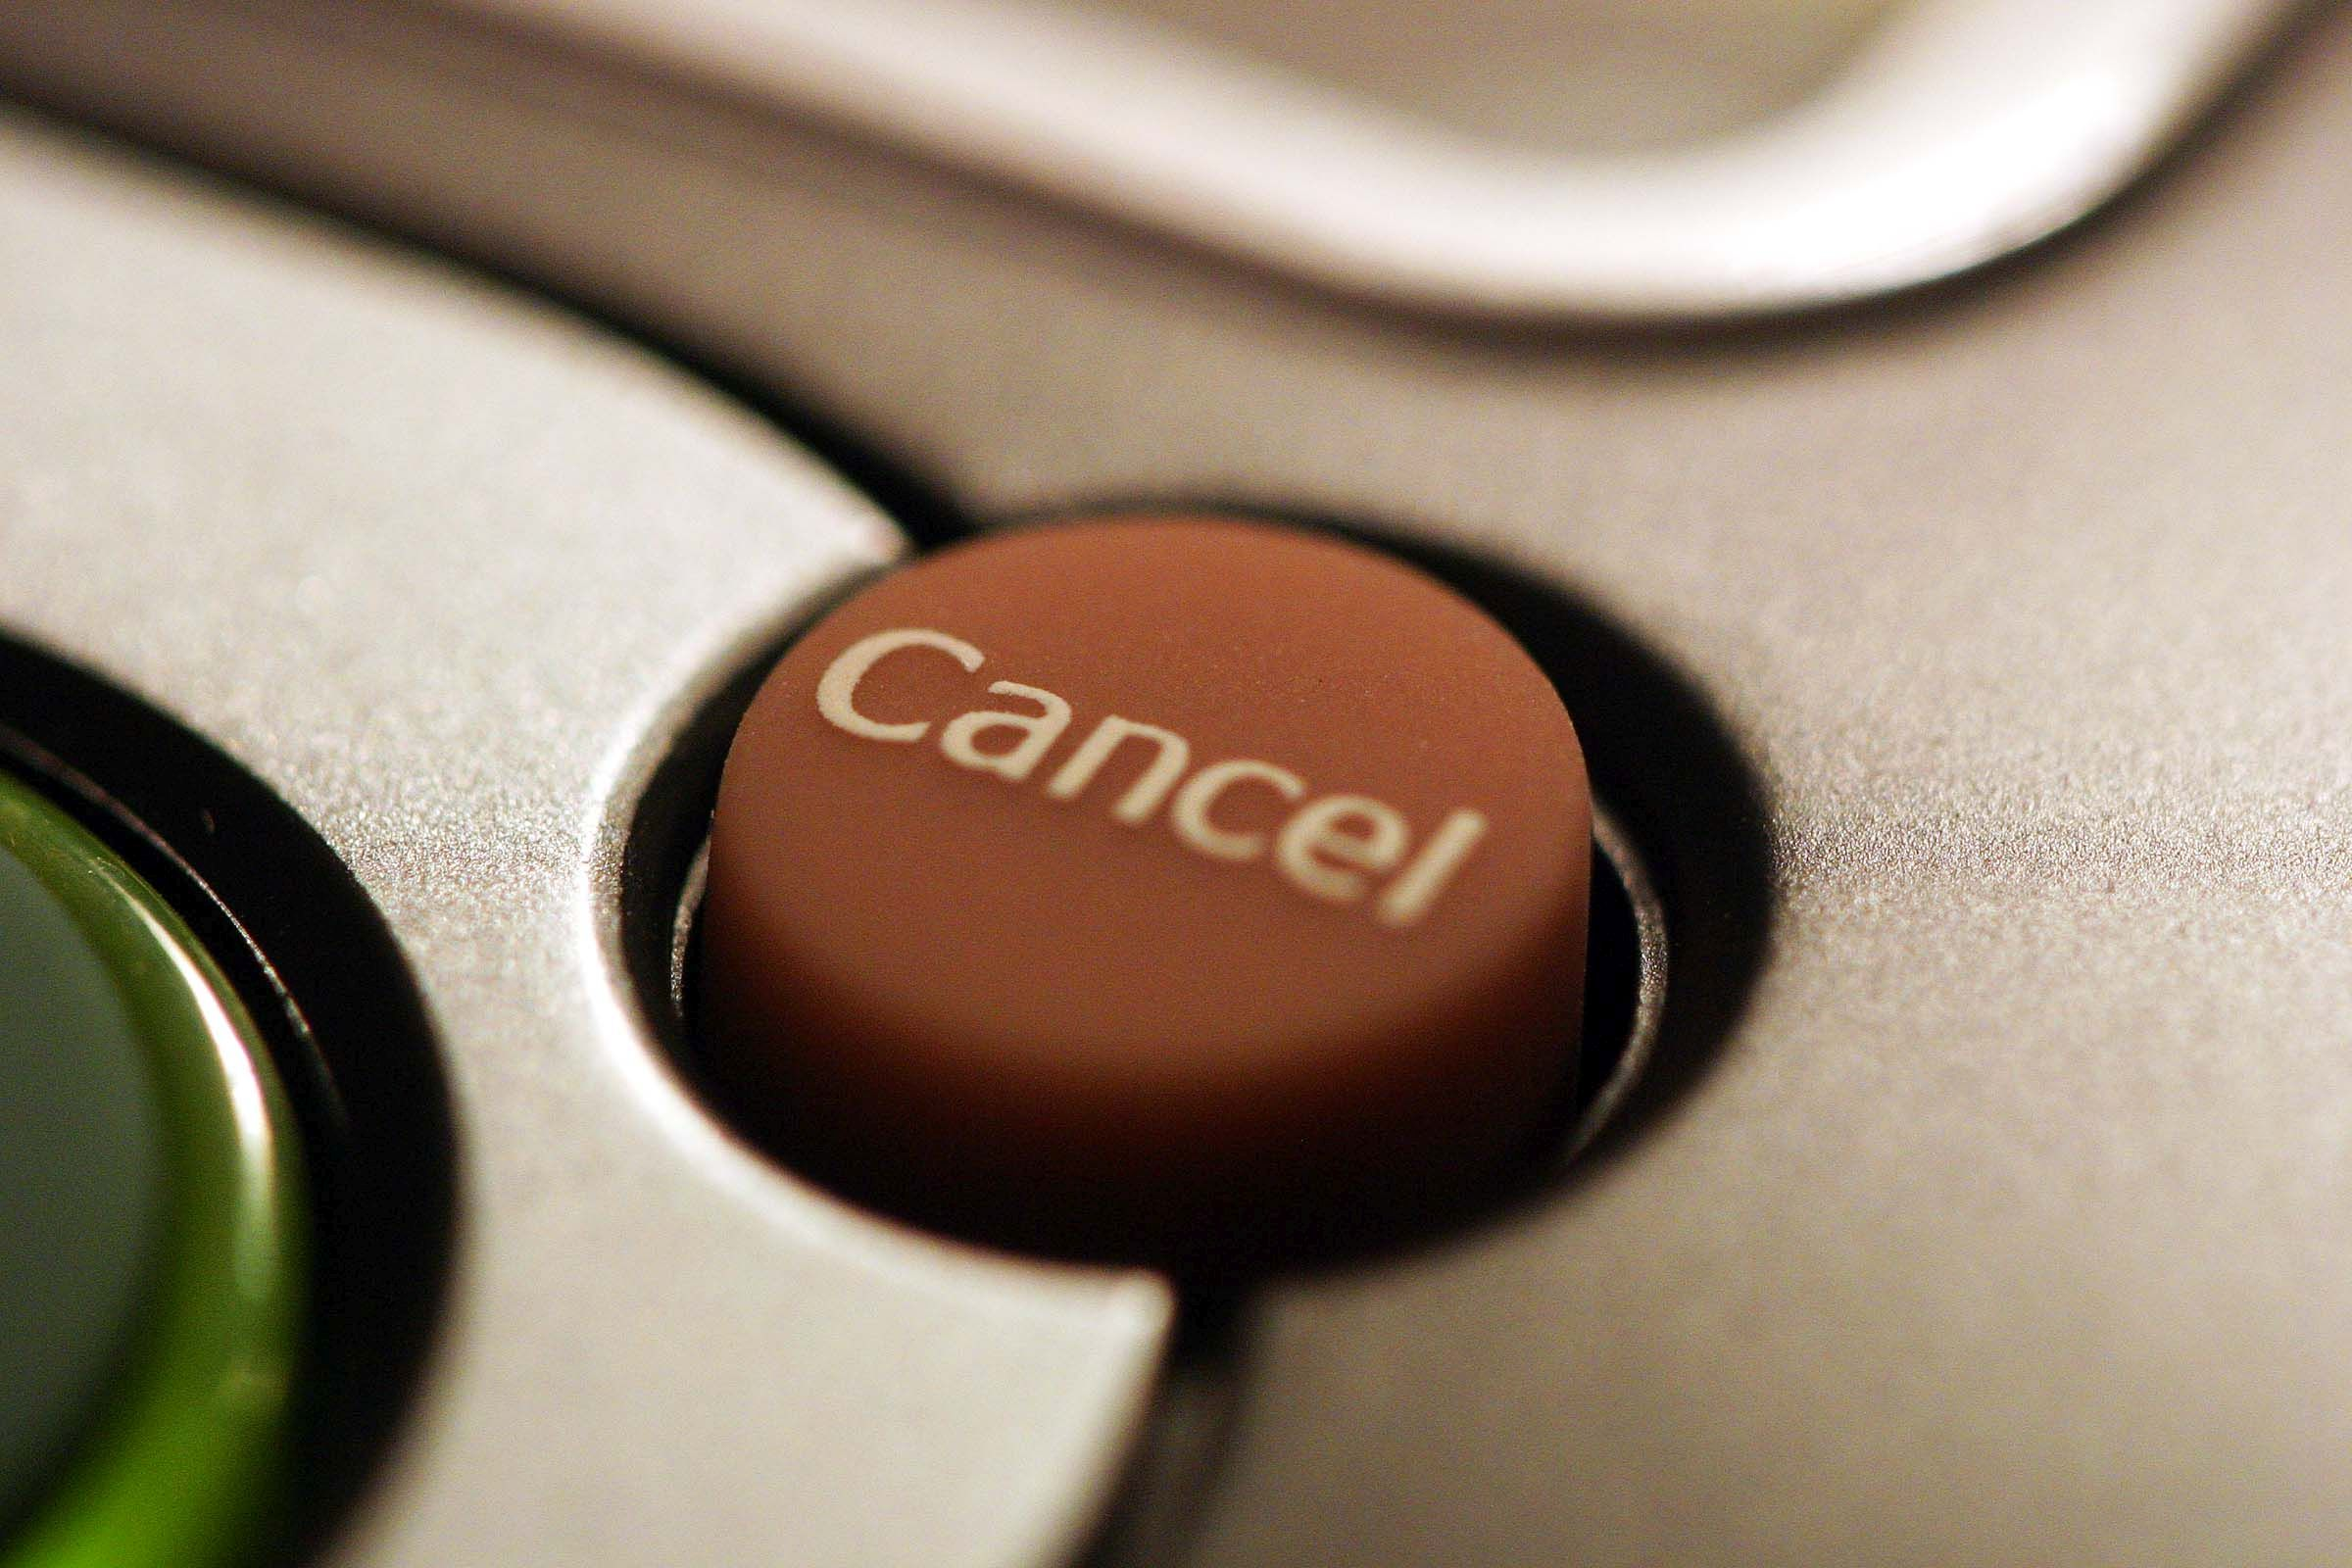 Cancel cloud computing service